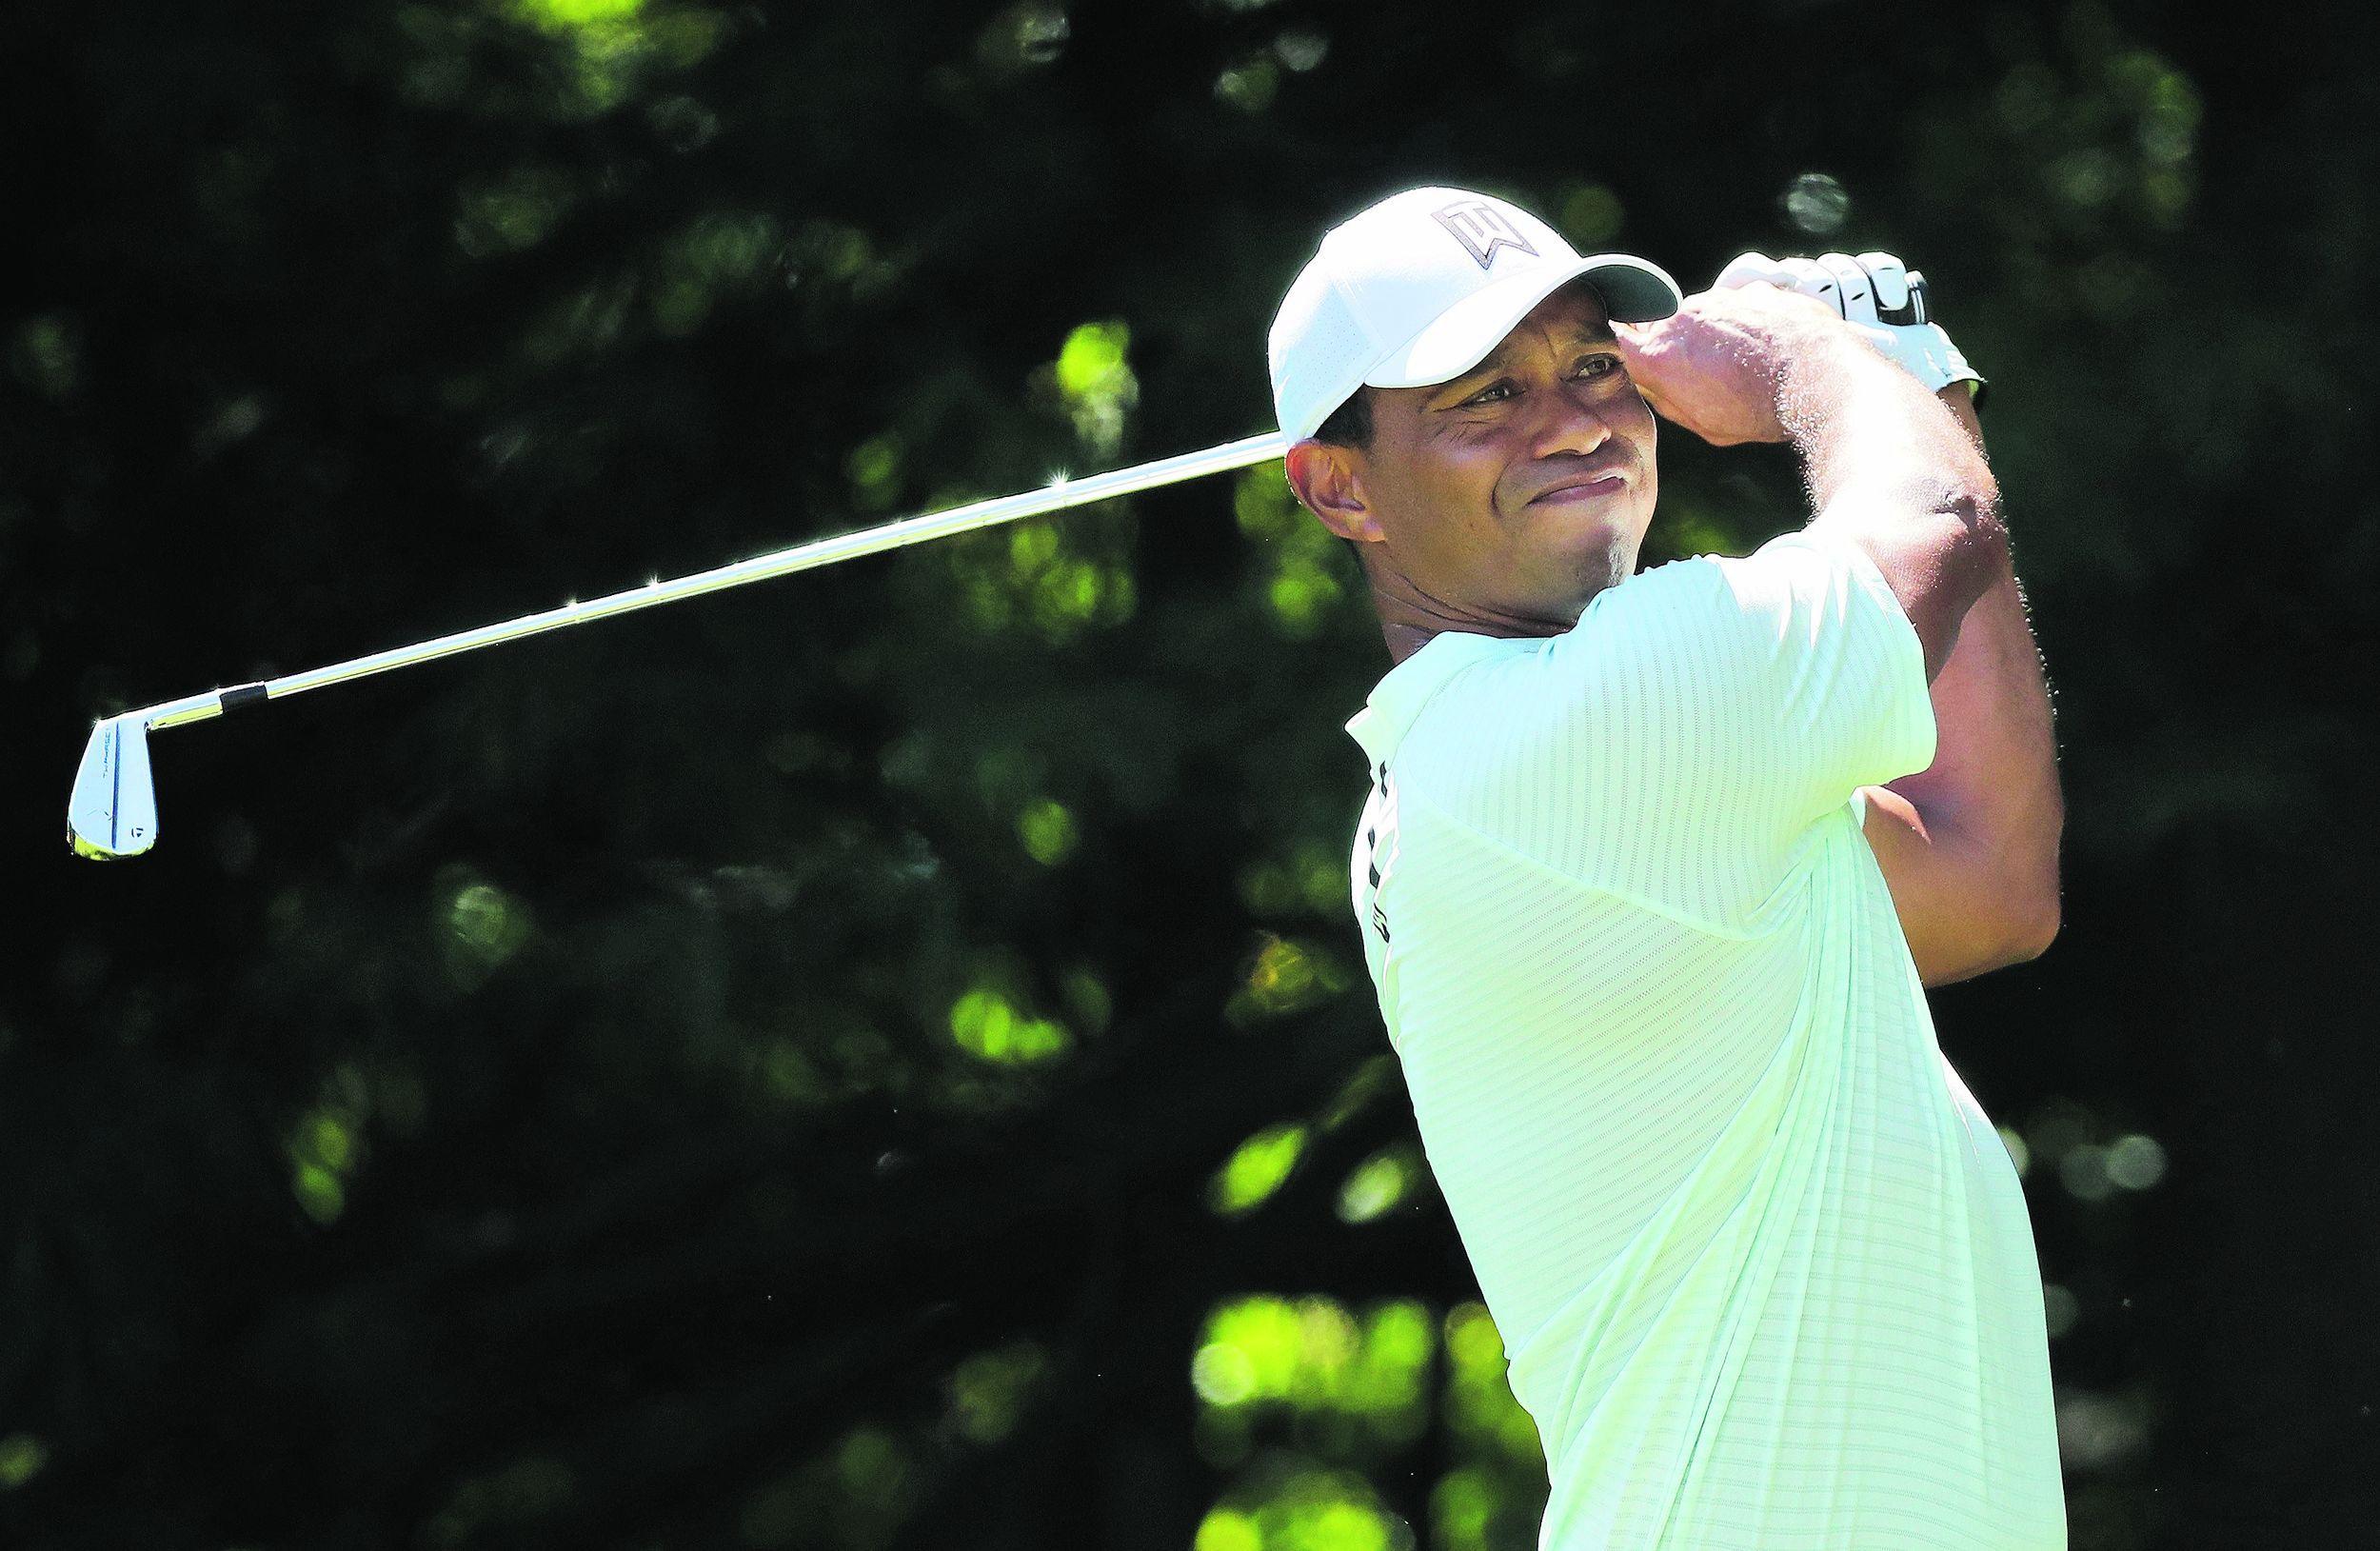 Golf - Ryder Cup - Tiger Woods, la belle surprise de la Ryder Cup 2018 en France